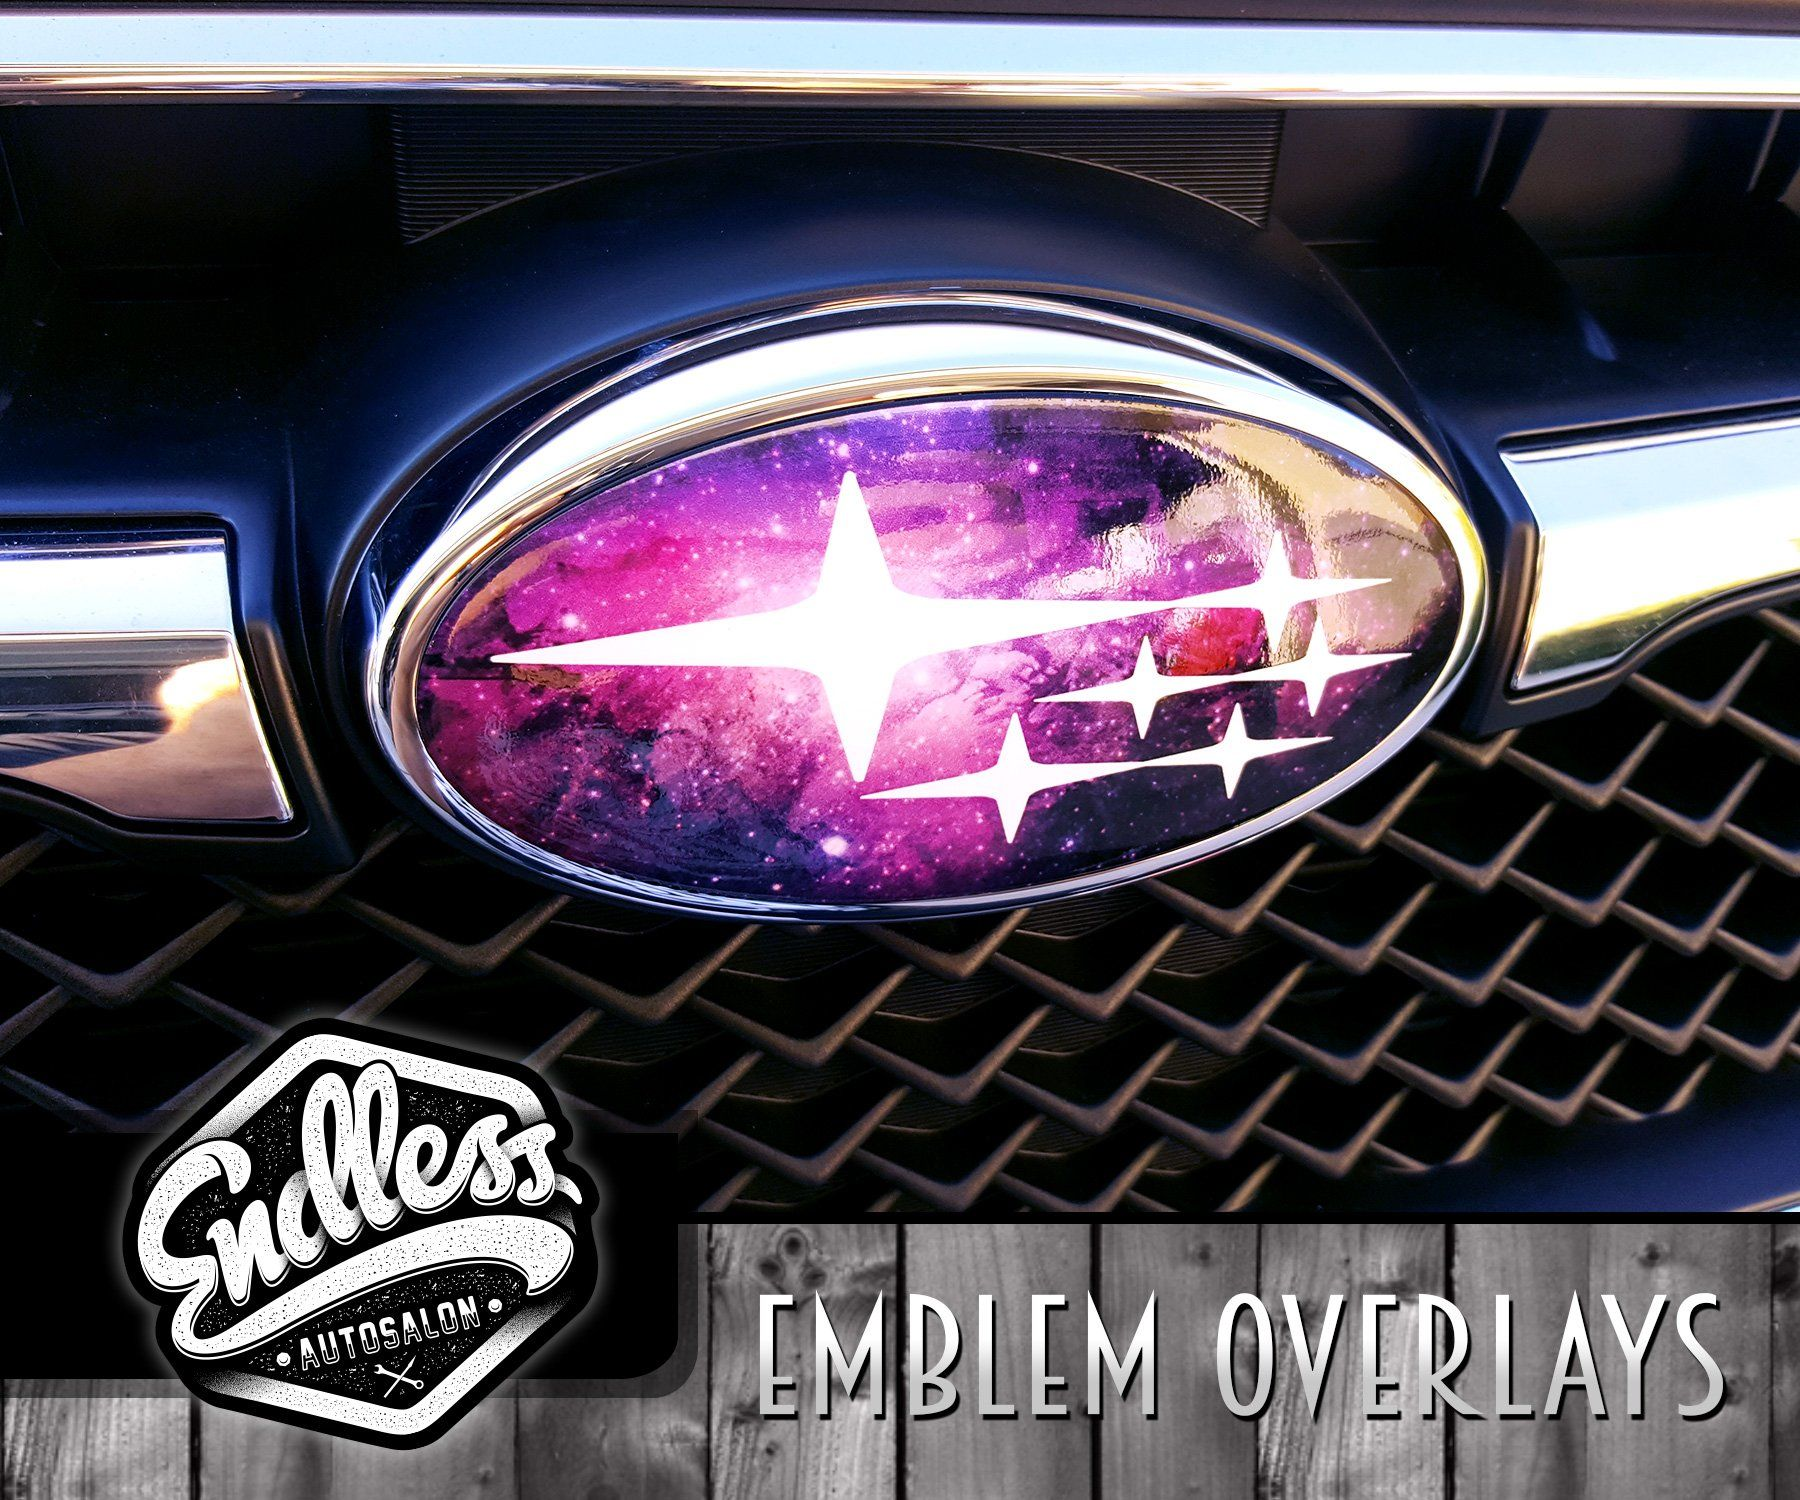 Subaru Galaxy Emblem Overlays Endless Autosalon Subaru Wrx Wrx Subaru